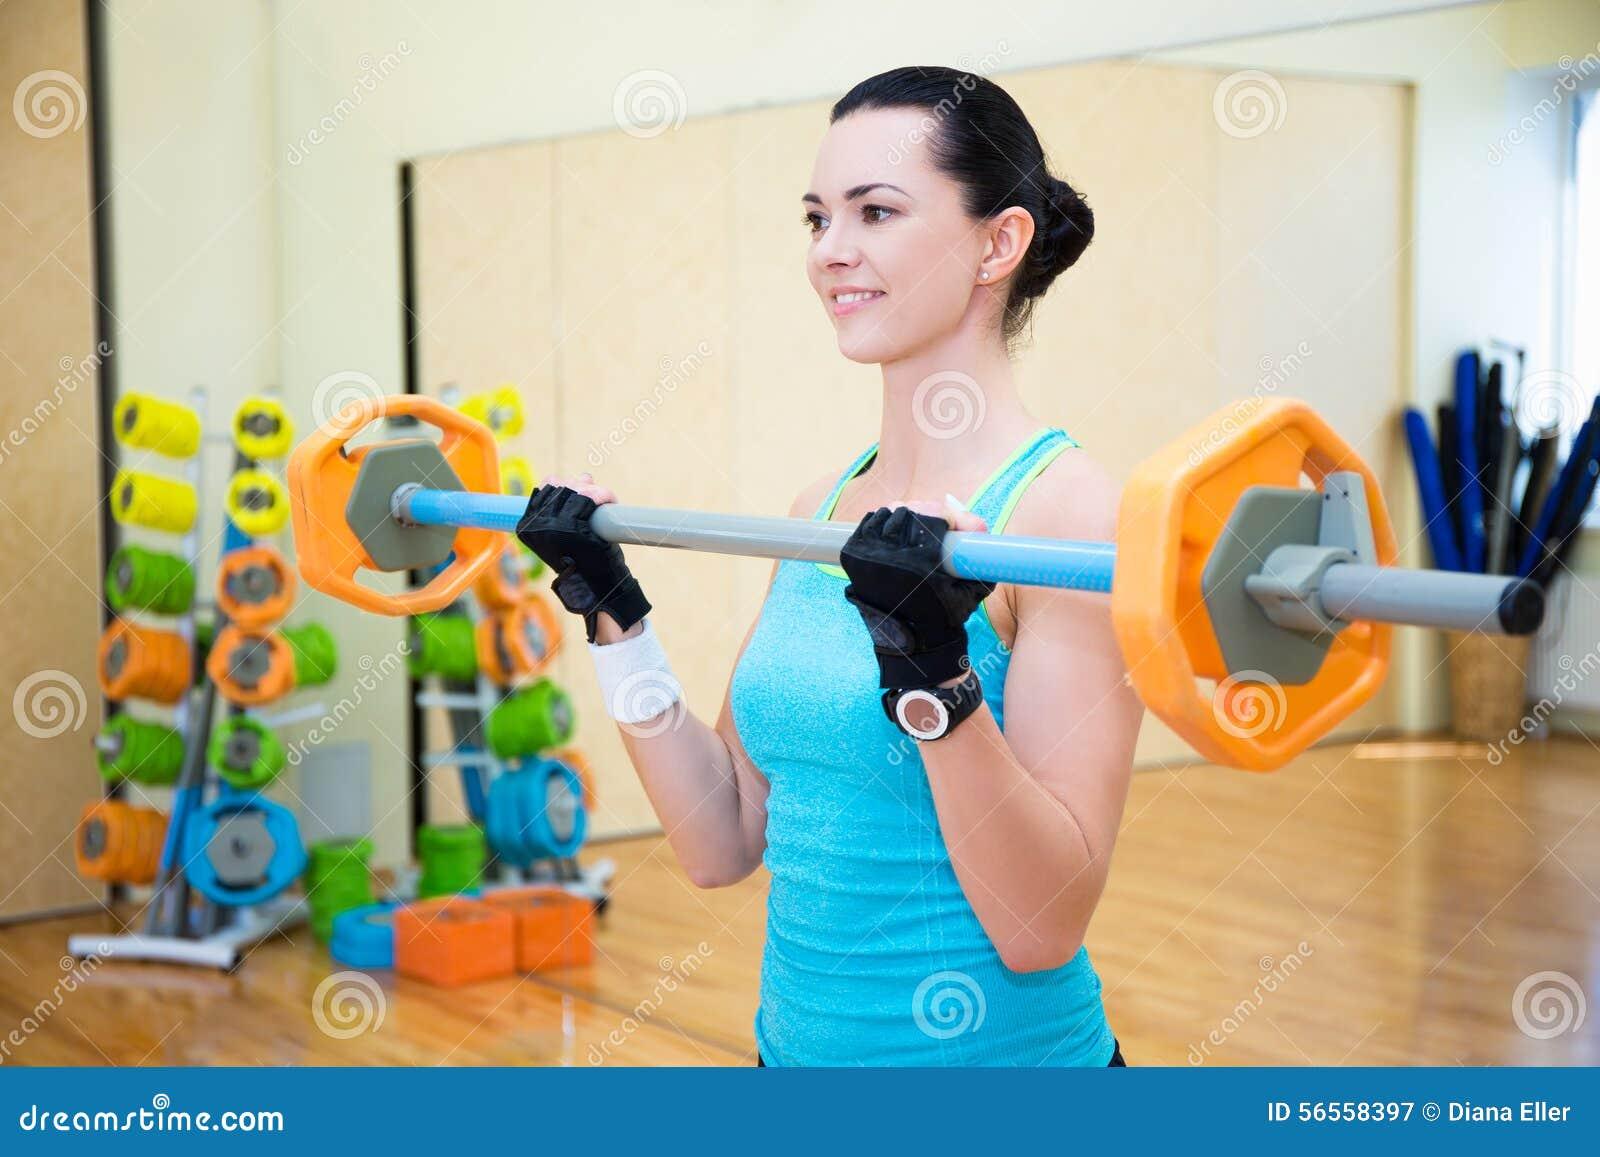 Download Πορτρέτο της όμορφης φίλαθλης άσκησης γυναικών με το Barbell στη GY Στοκ Εικόνα - εικόνα από lifestyle, άνθρωποι: 56558397